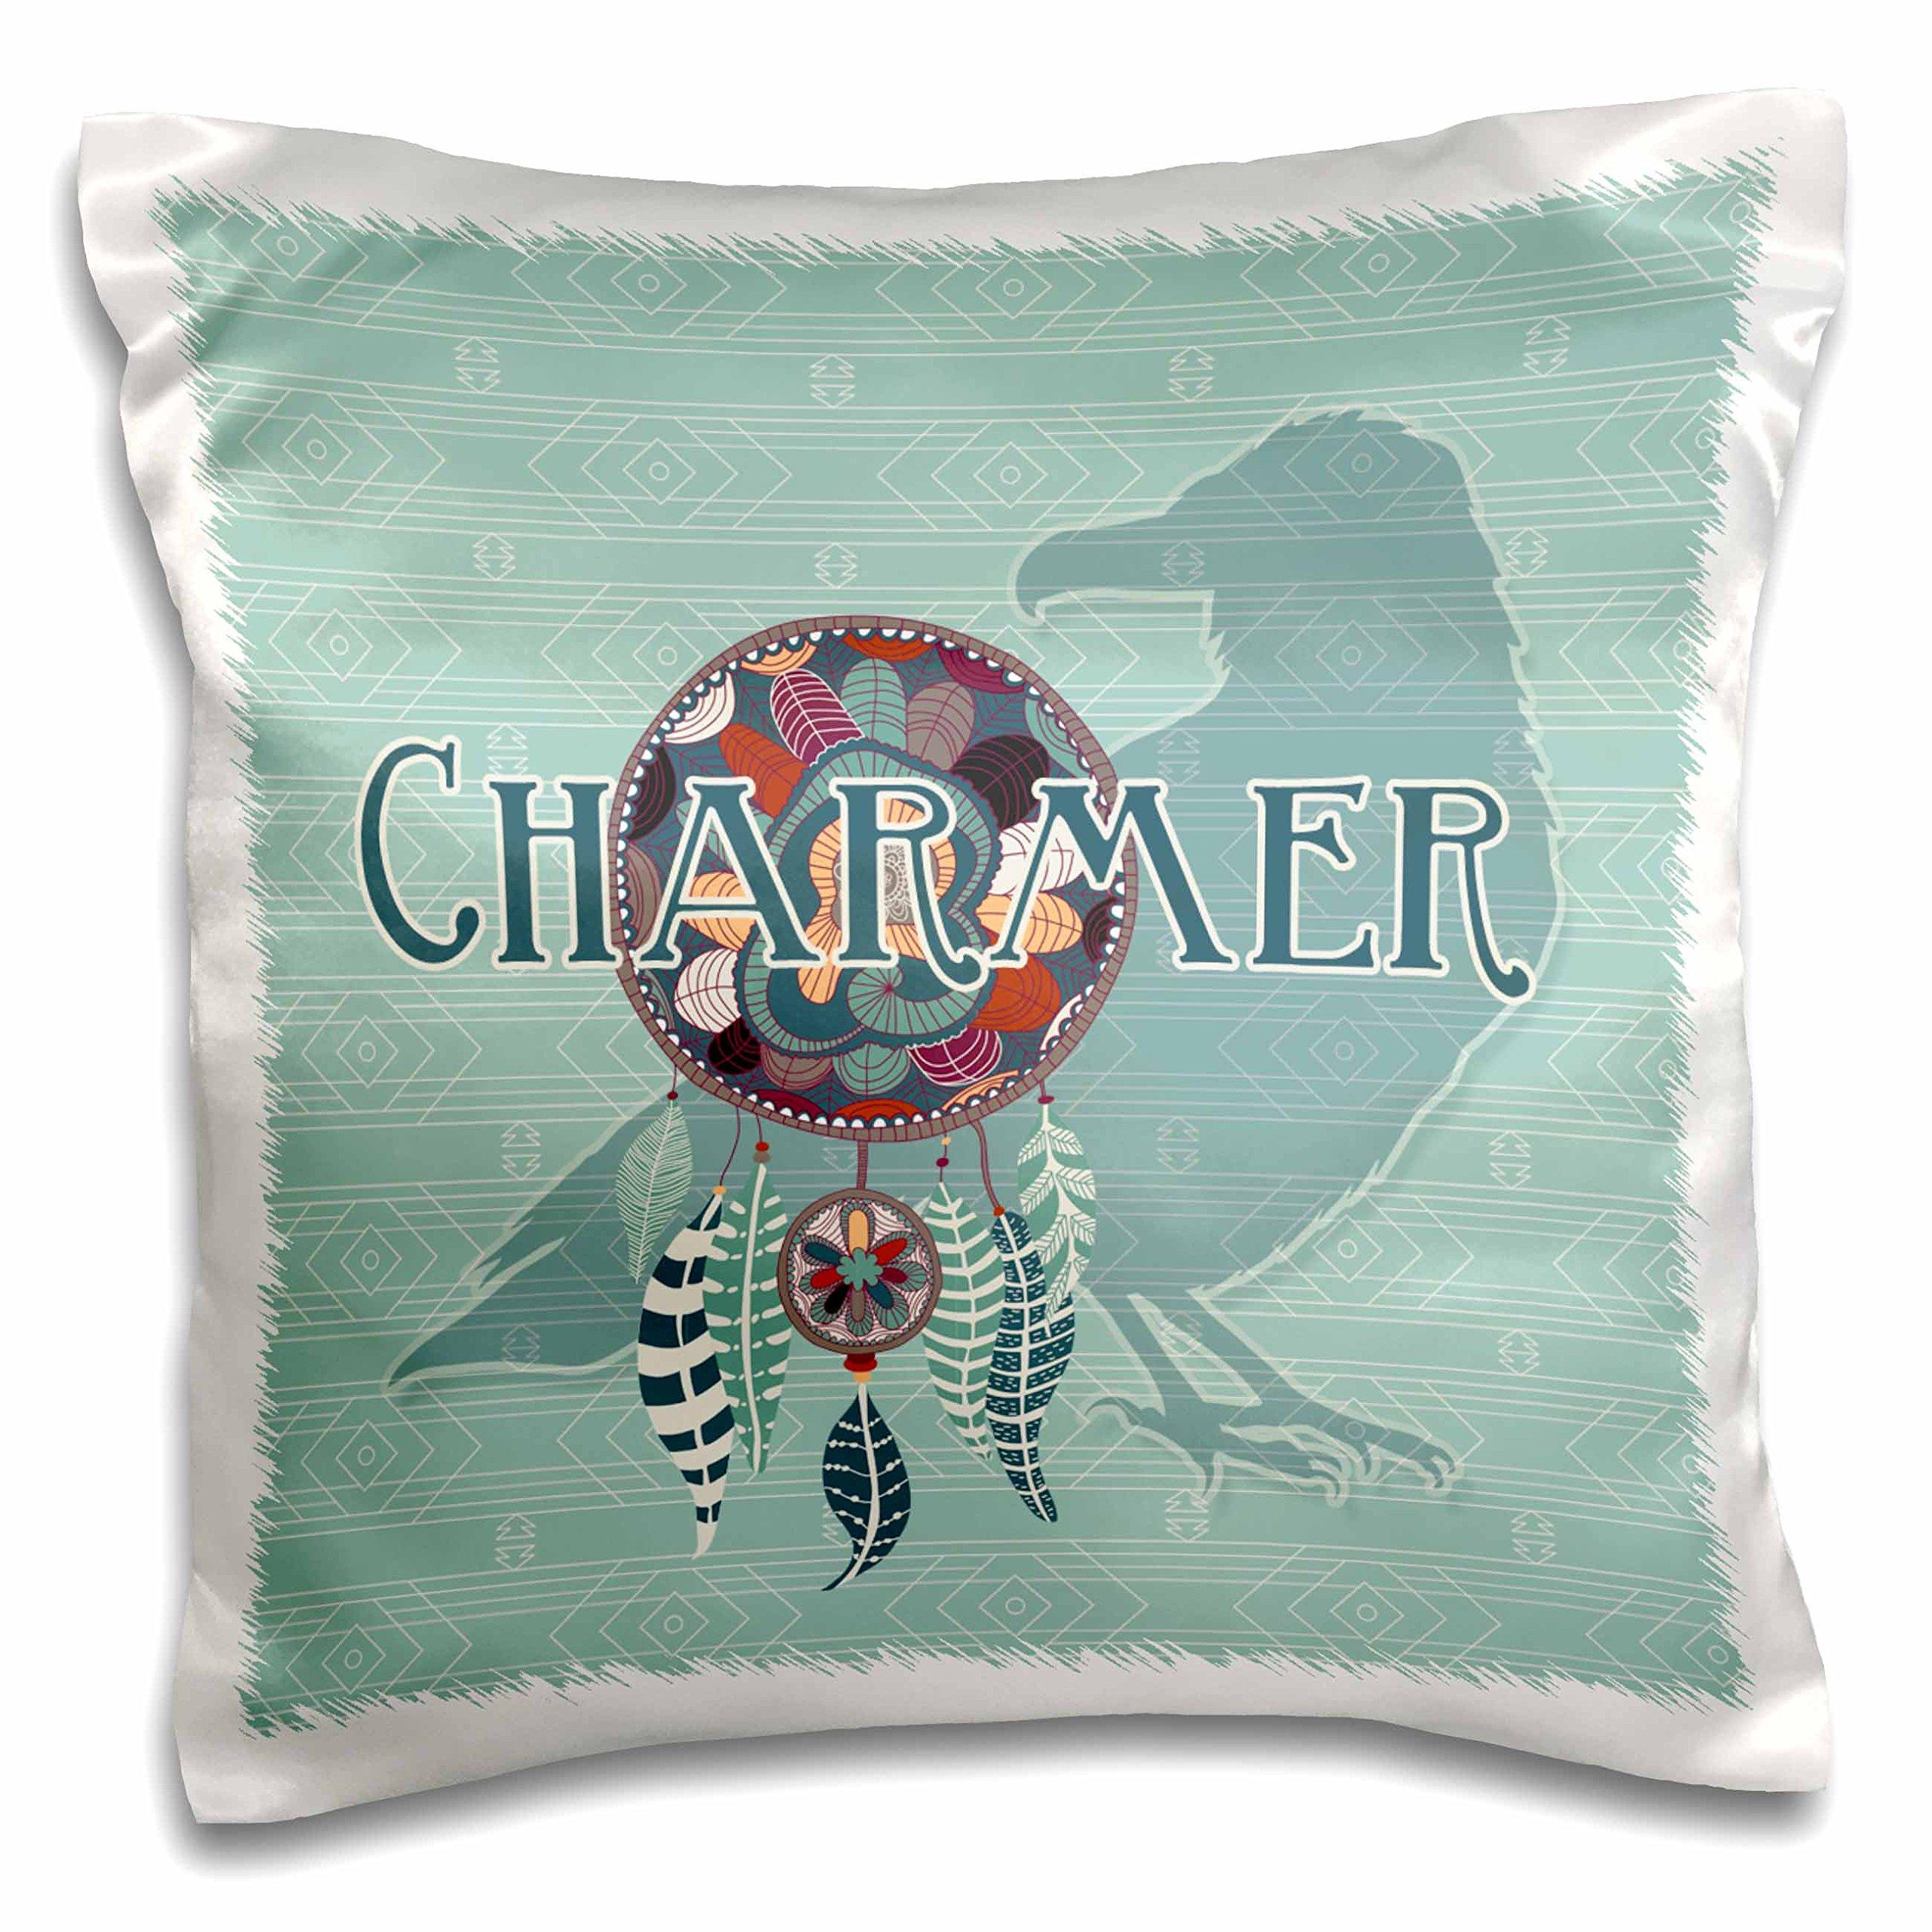 3dRose Raven Crow Native American Animal Spirit with Dream Catcher Charmer Pillow Case, 16 x 16''